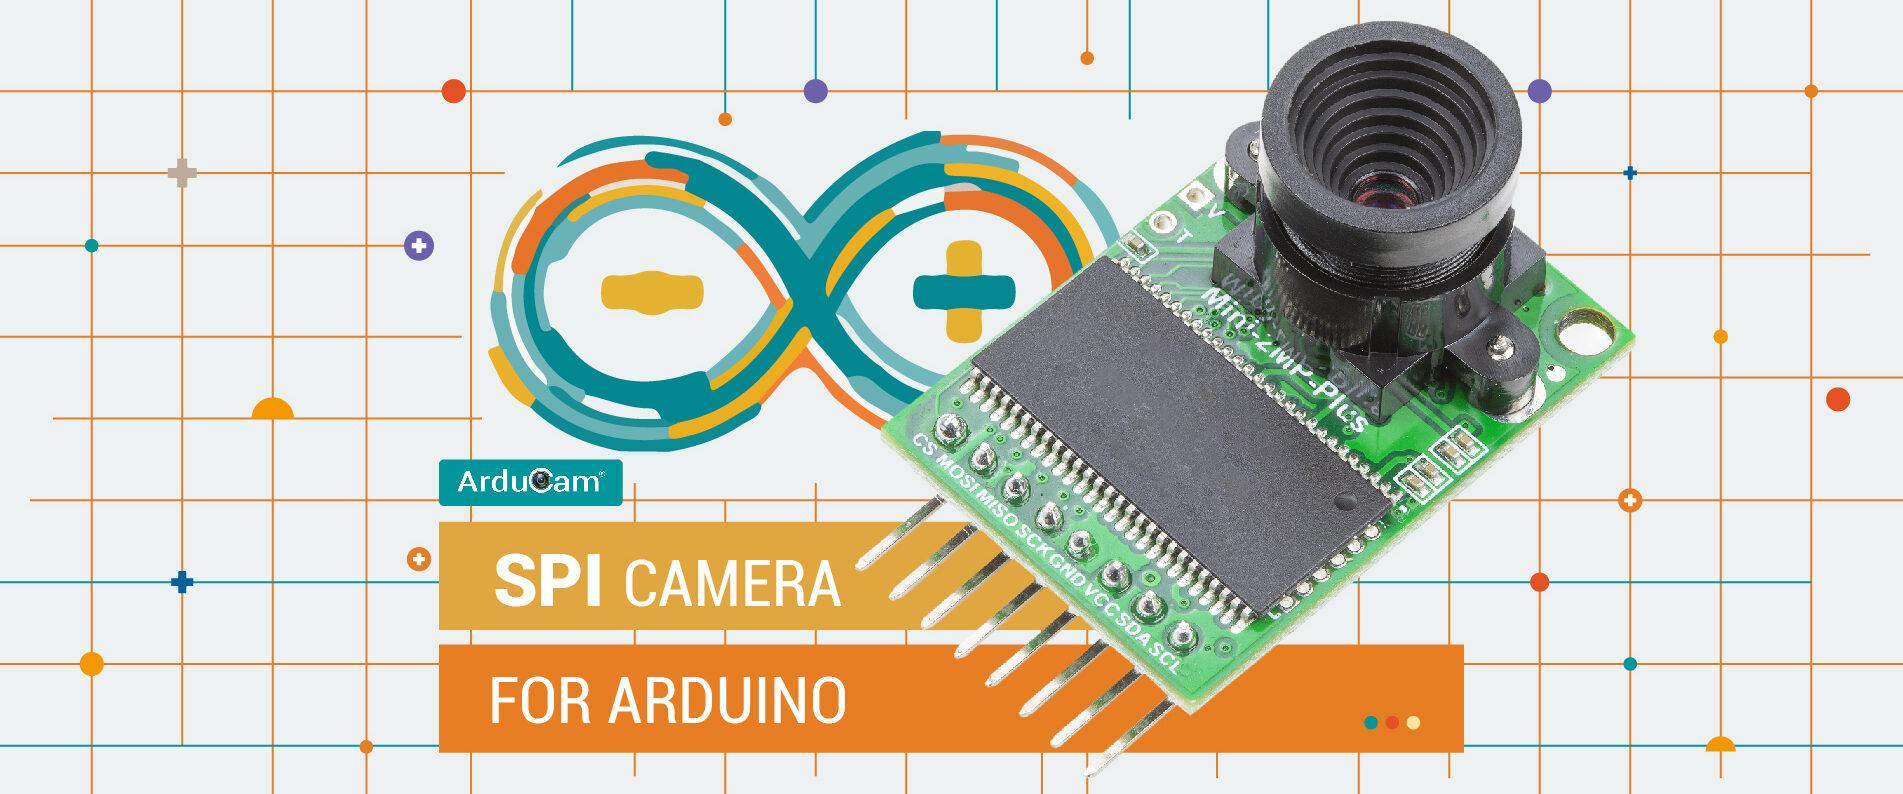 arducam-arduino-camera-spi-banner-slider-home-